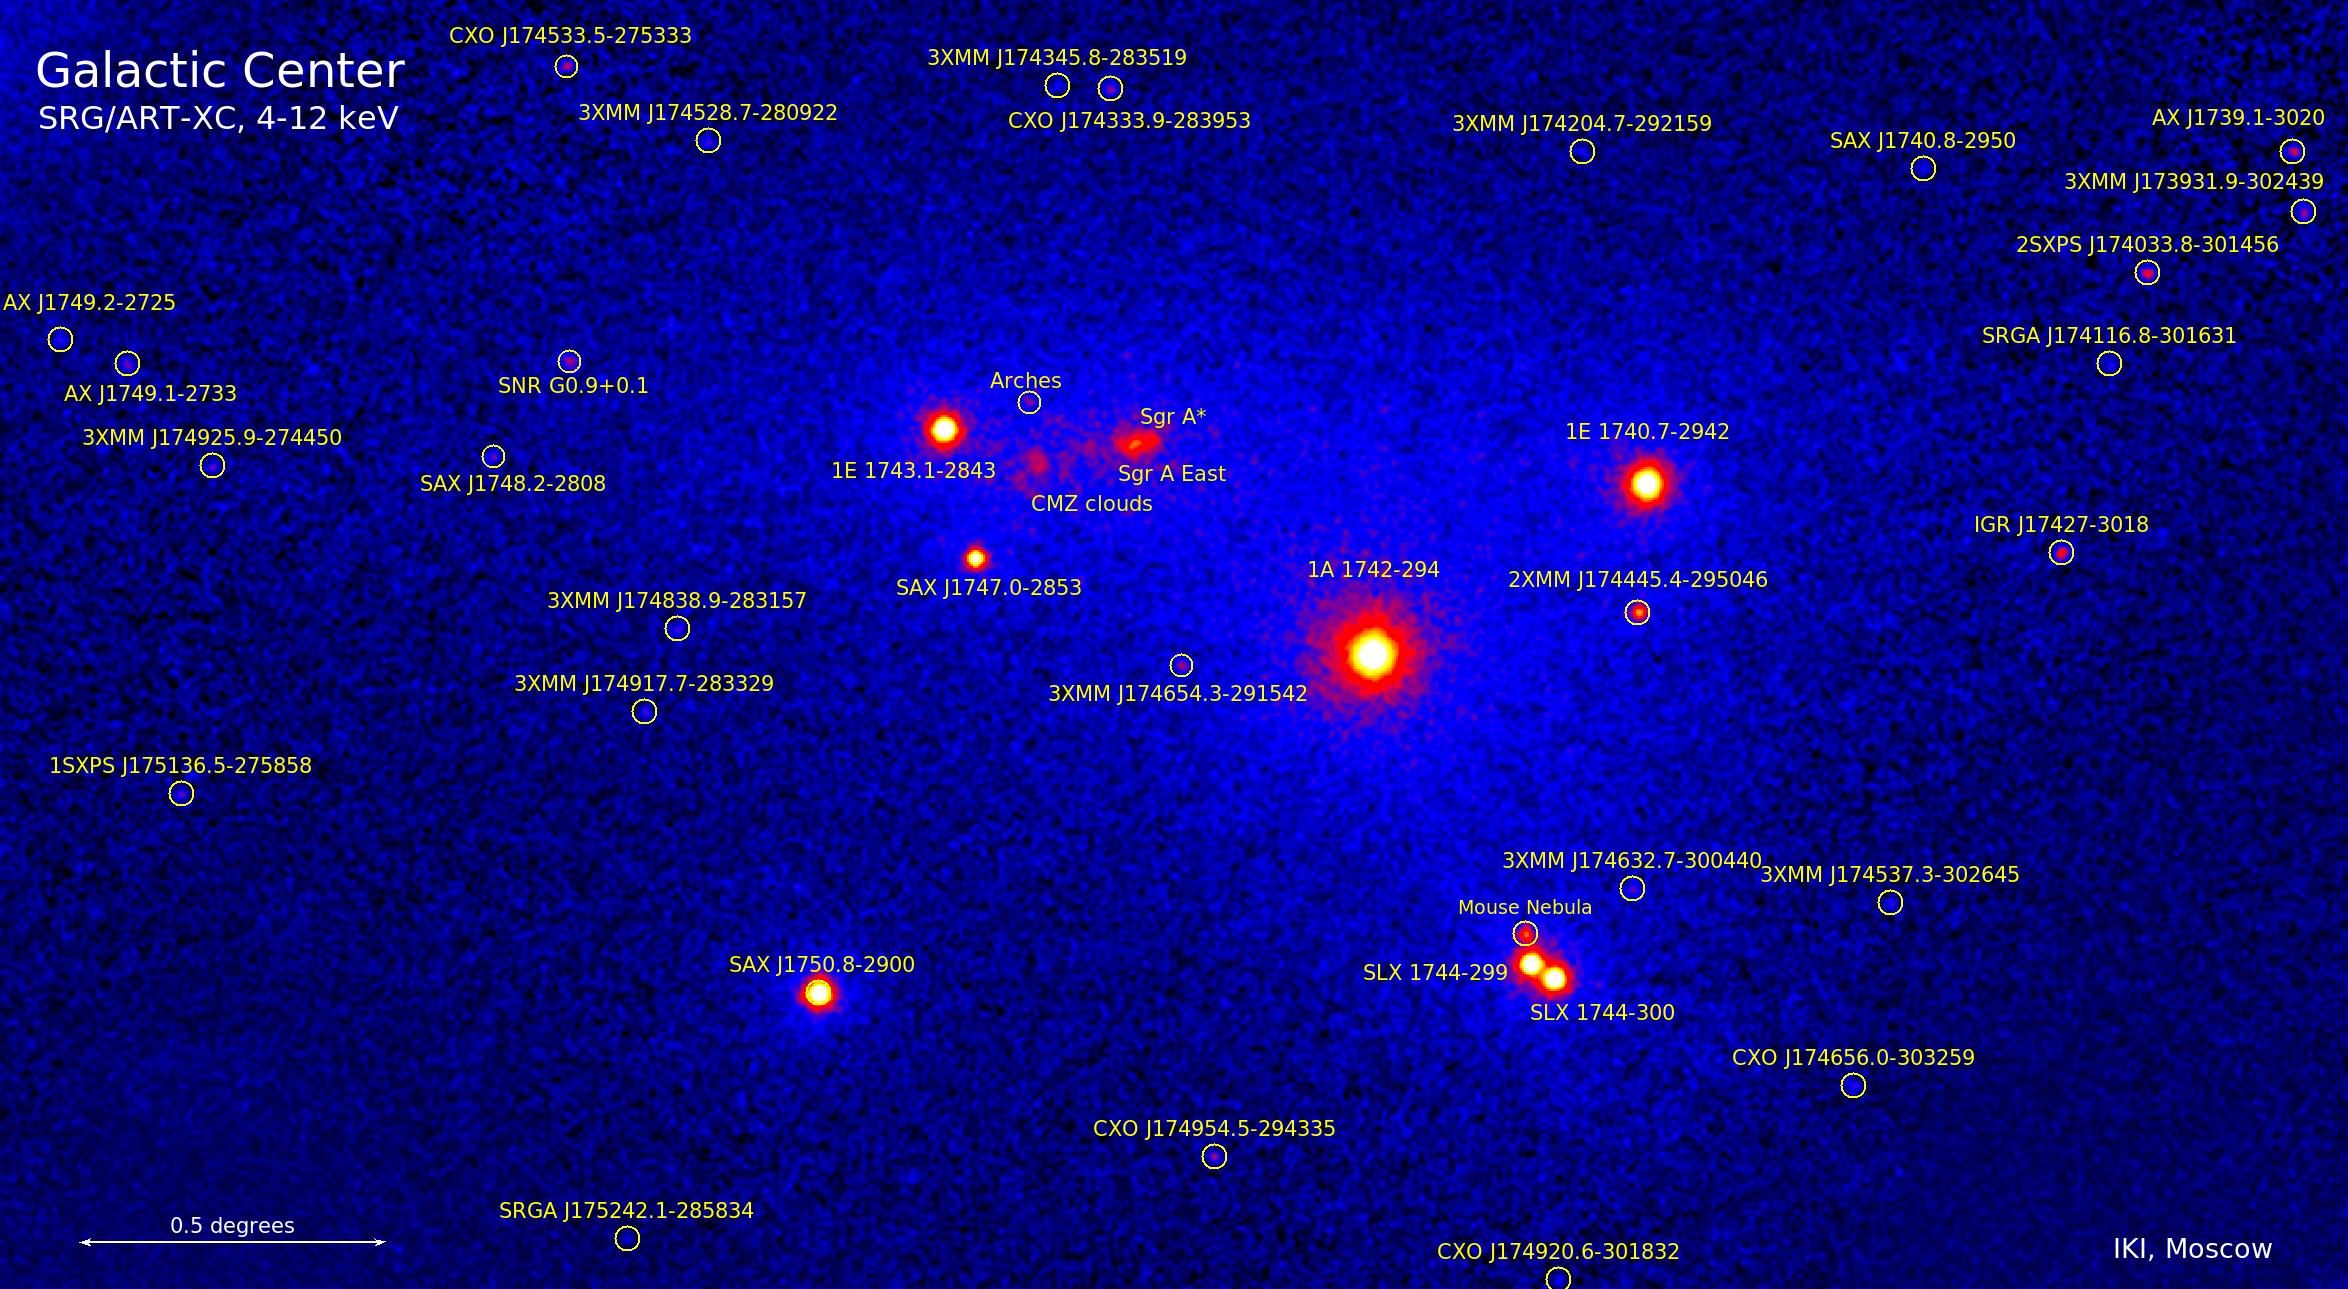 http://press.cosmos.ru/sites/default/files/pics/art-xc_galactic_bulge.png